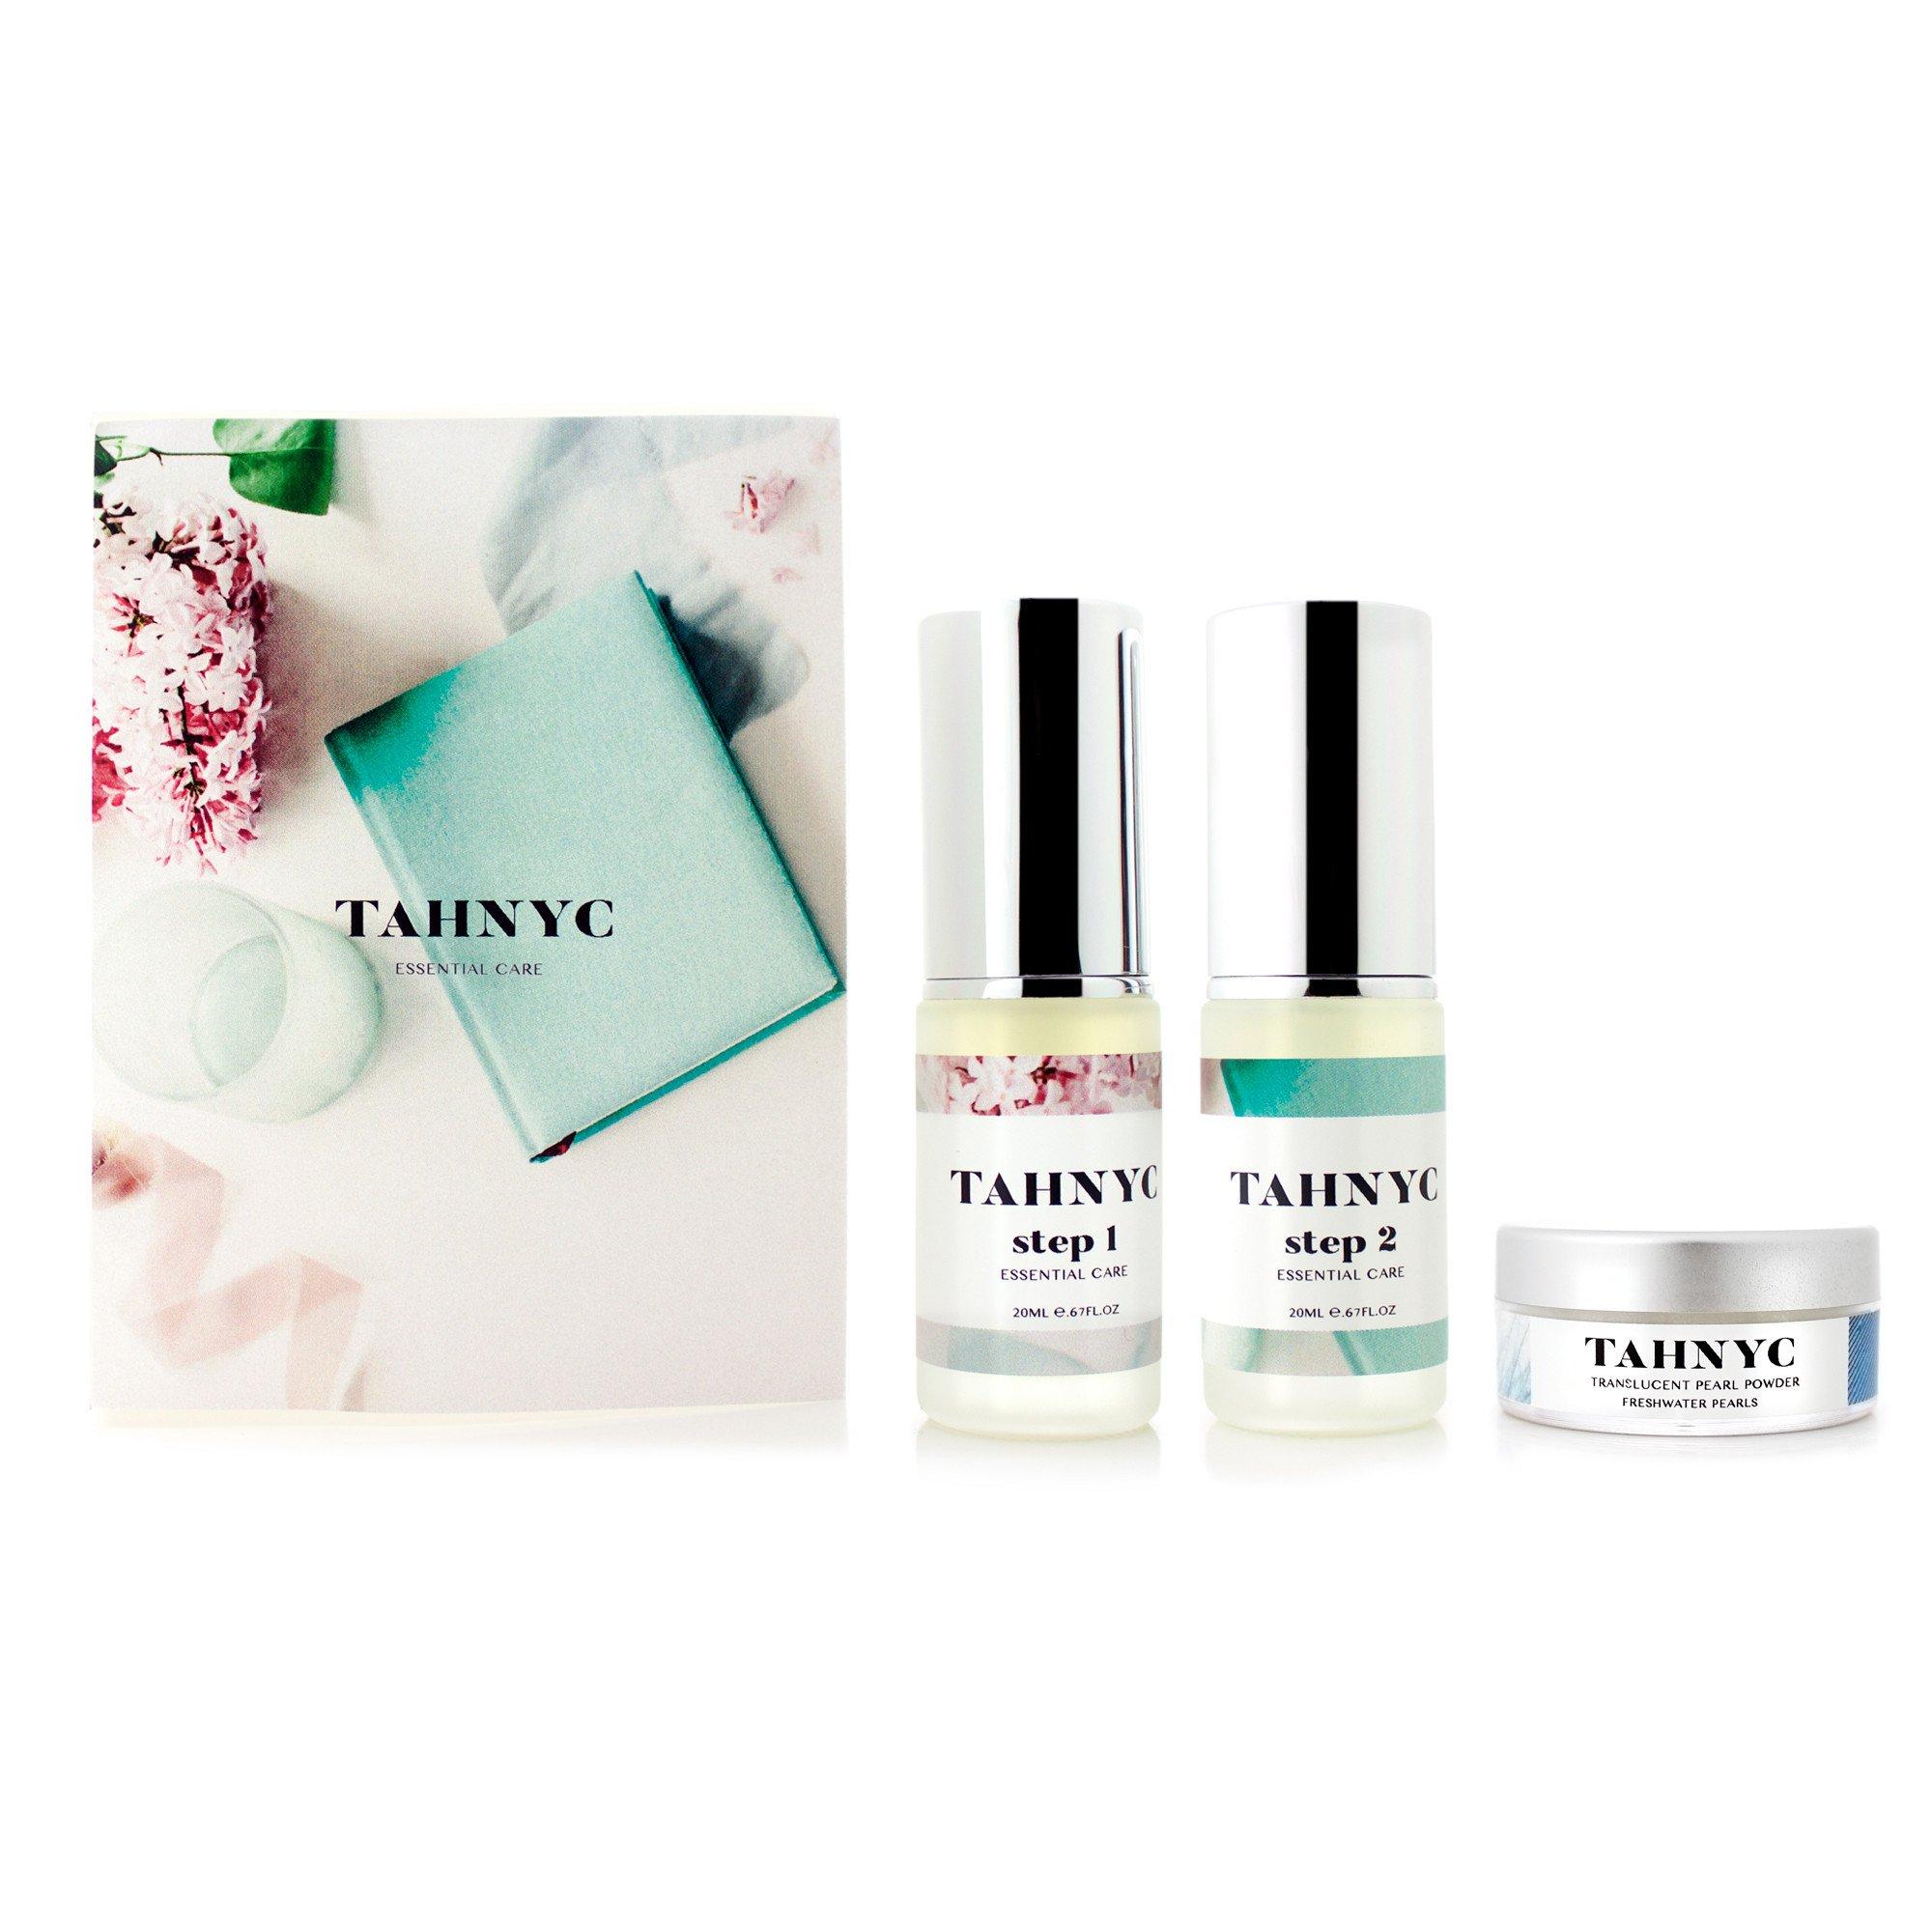 Tahnyc-Radiant-Skin.jpg